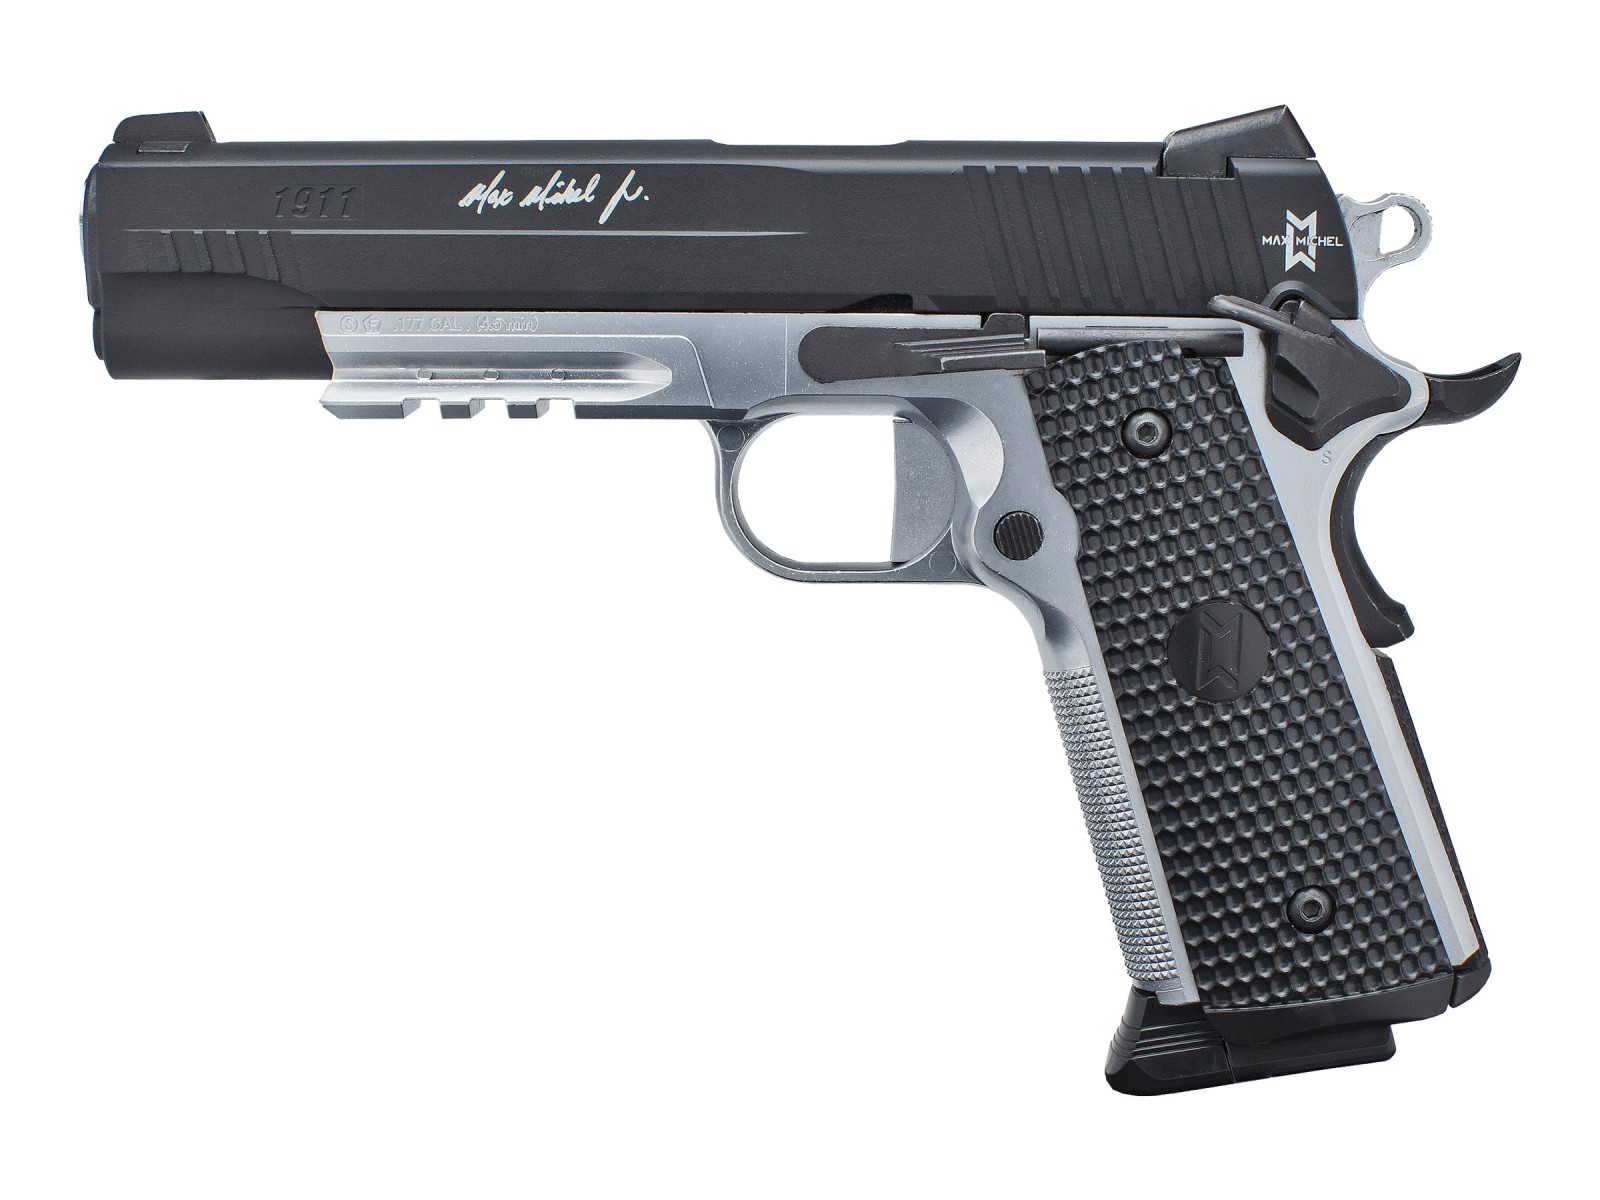 Cheap Sig Sauer Max Michel 1911 Full Metal Blowback CO2 BB Pistol 0.177